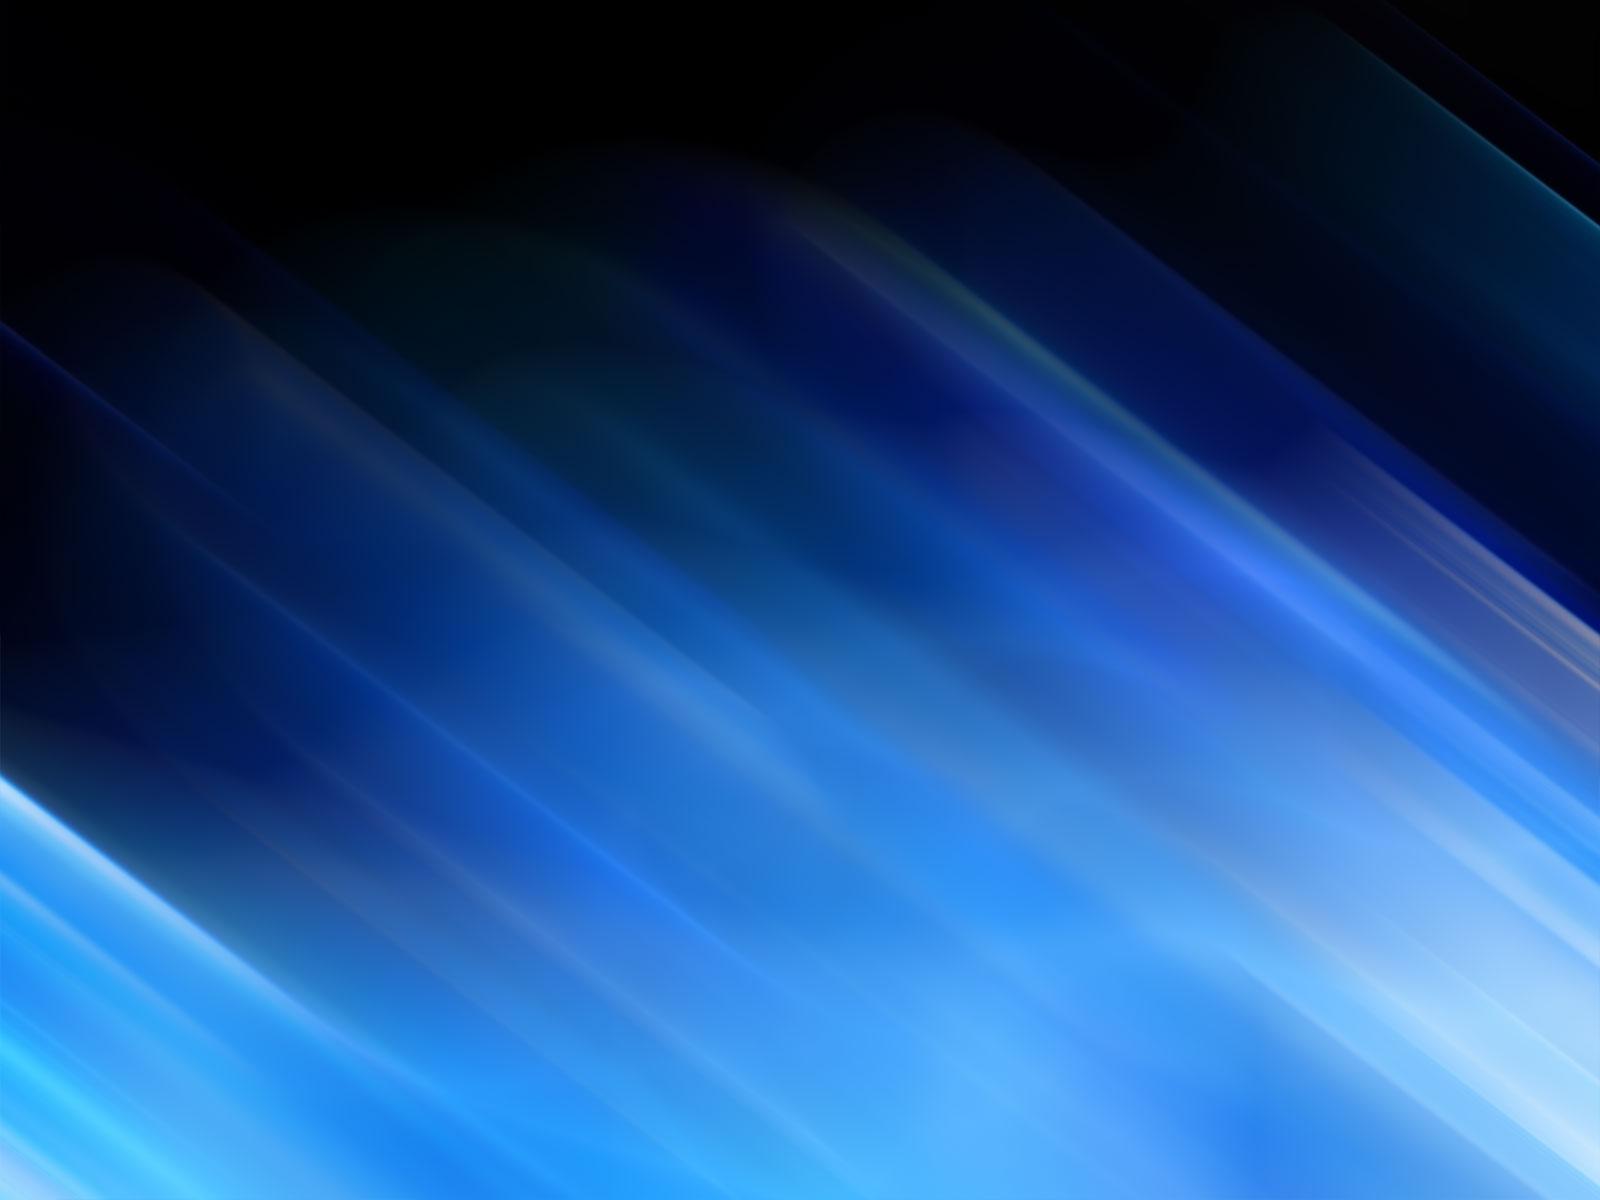 Info Wallpapers hd wallpaper abstract blue 1600x1200